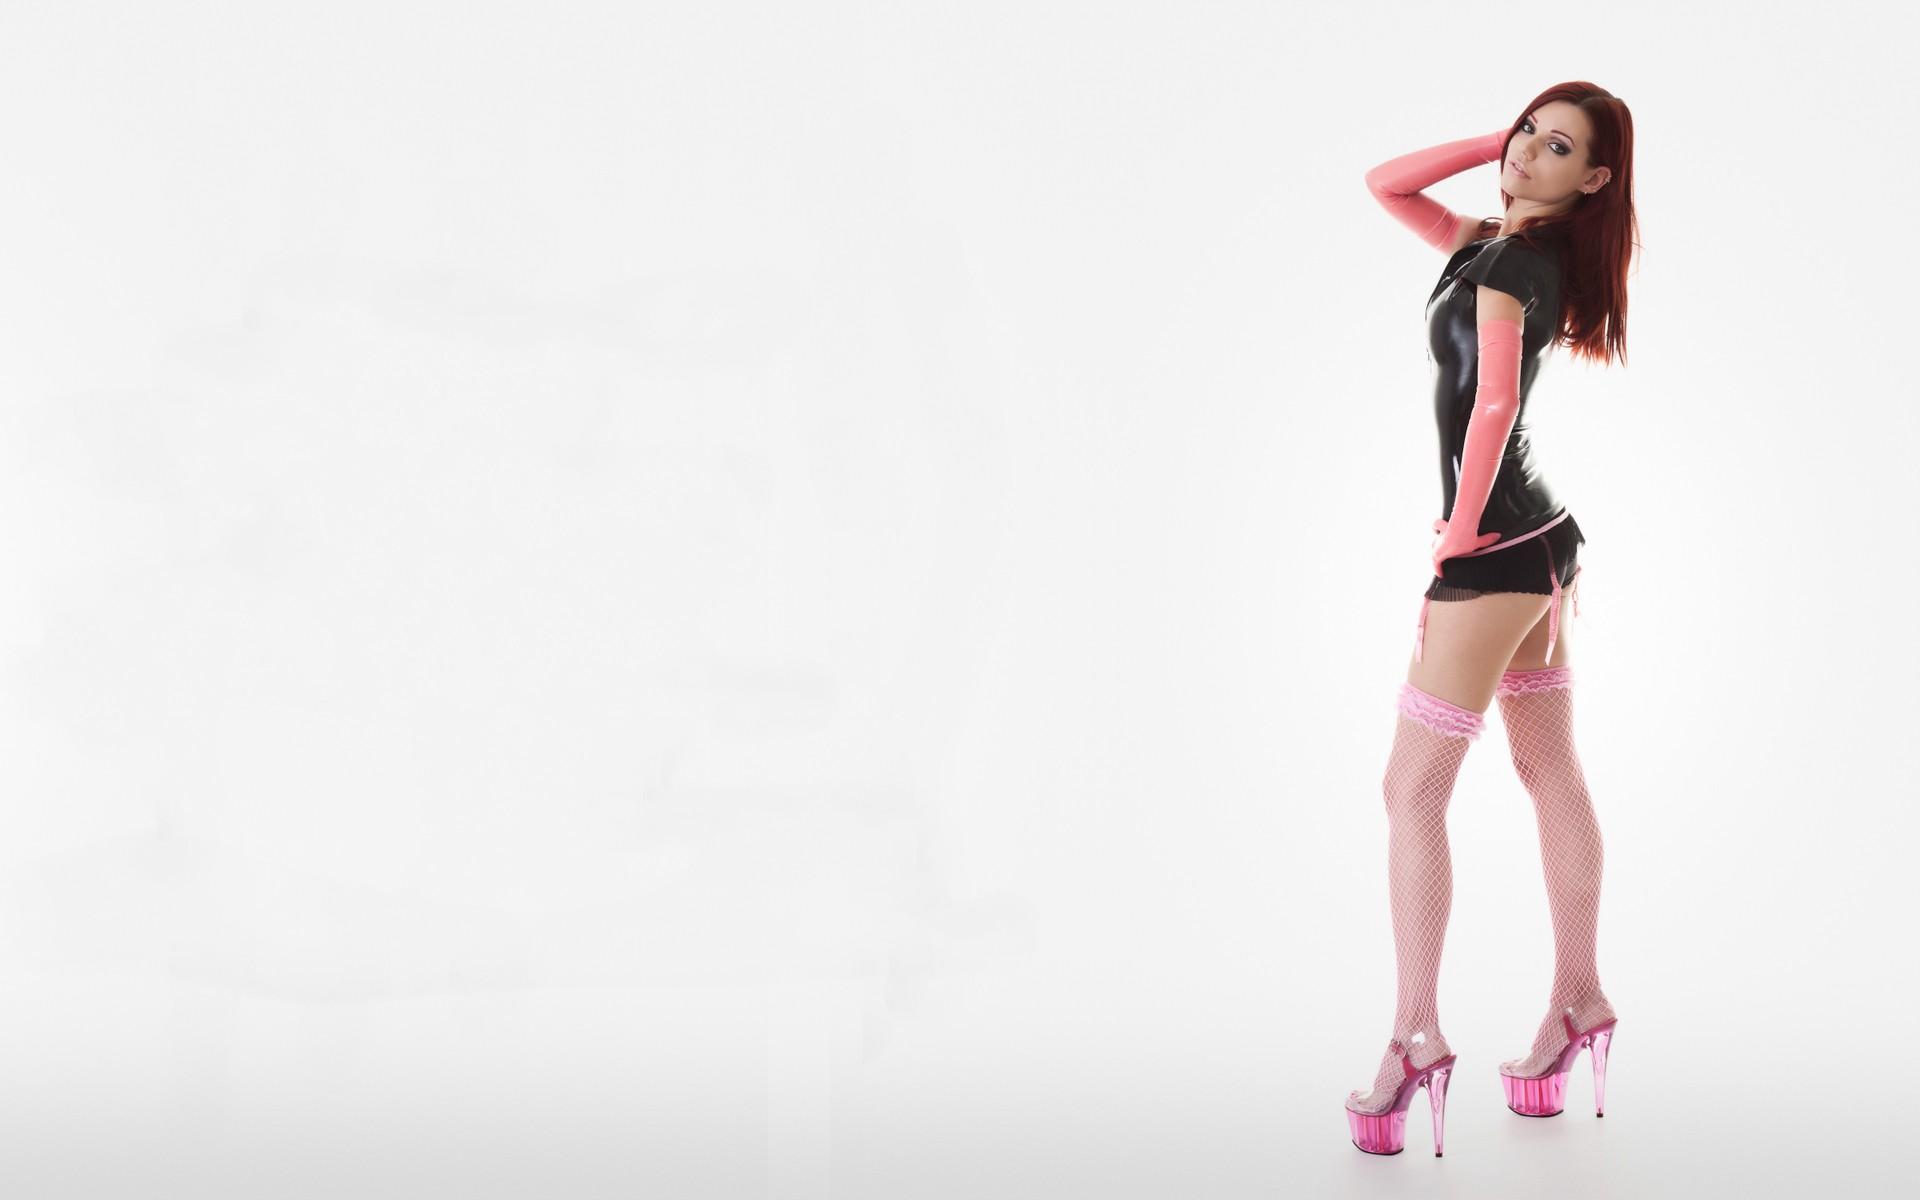 People 1920x1200 latex high heels redhead fishnet stockings stockings pink fishnet pink stockings pink lipstick pink heels looking at viewer simple background white background garter belt looking over shoulder gloves elbow gloves pierced ears